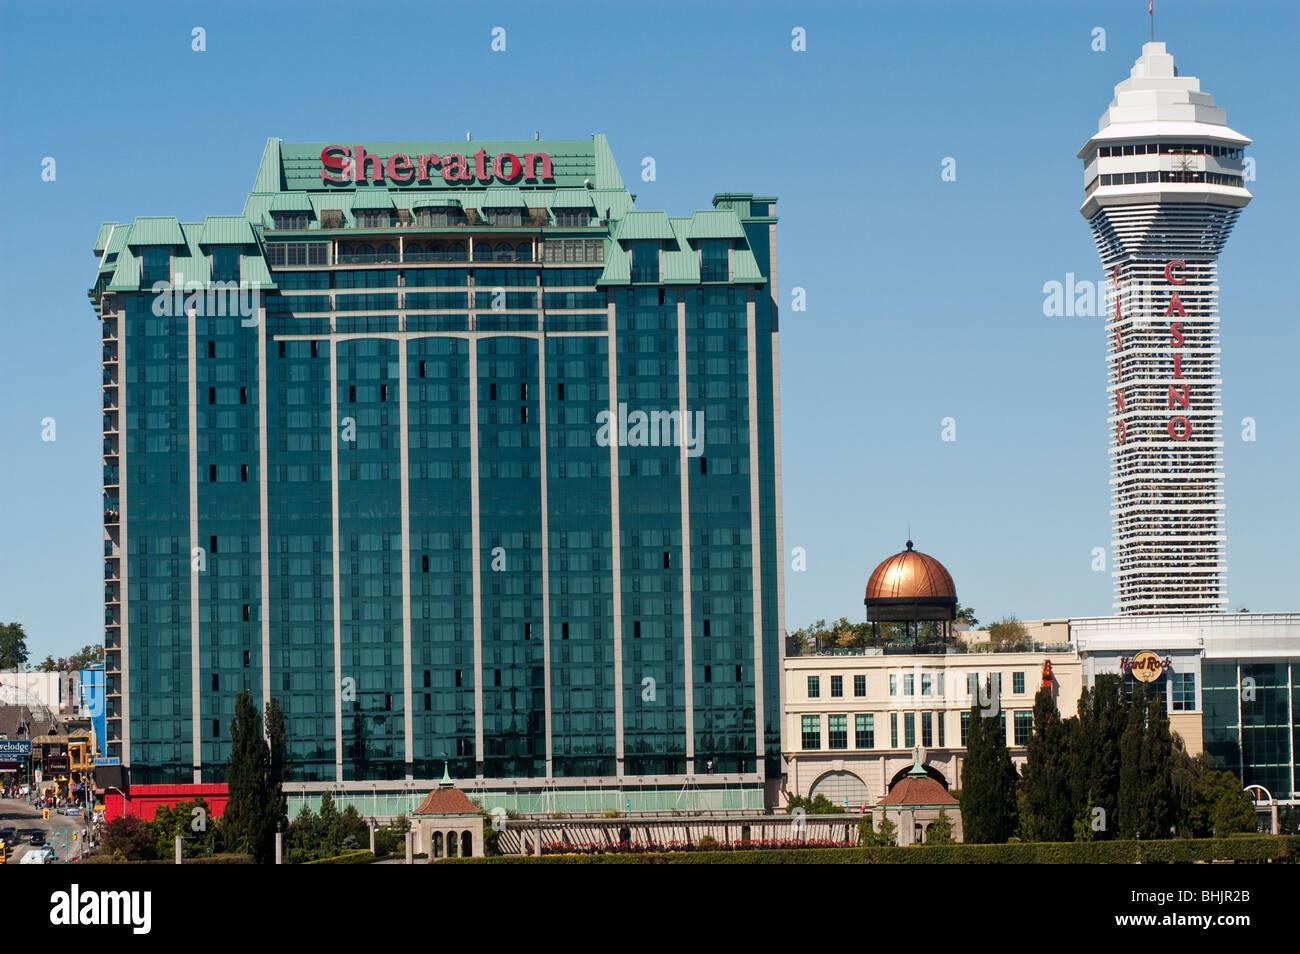 Sheraton casino niagara casino greyhounds today